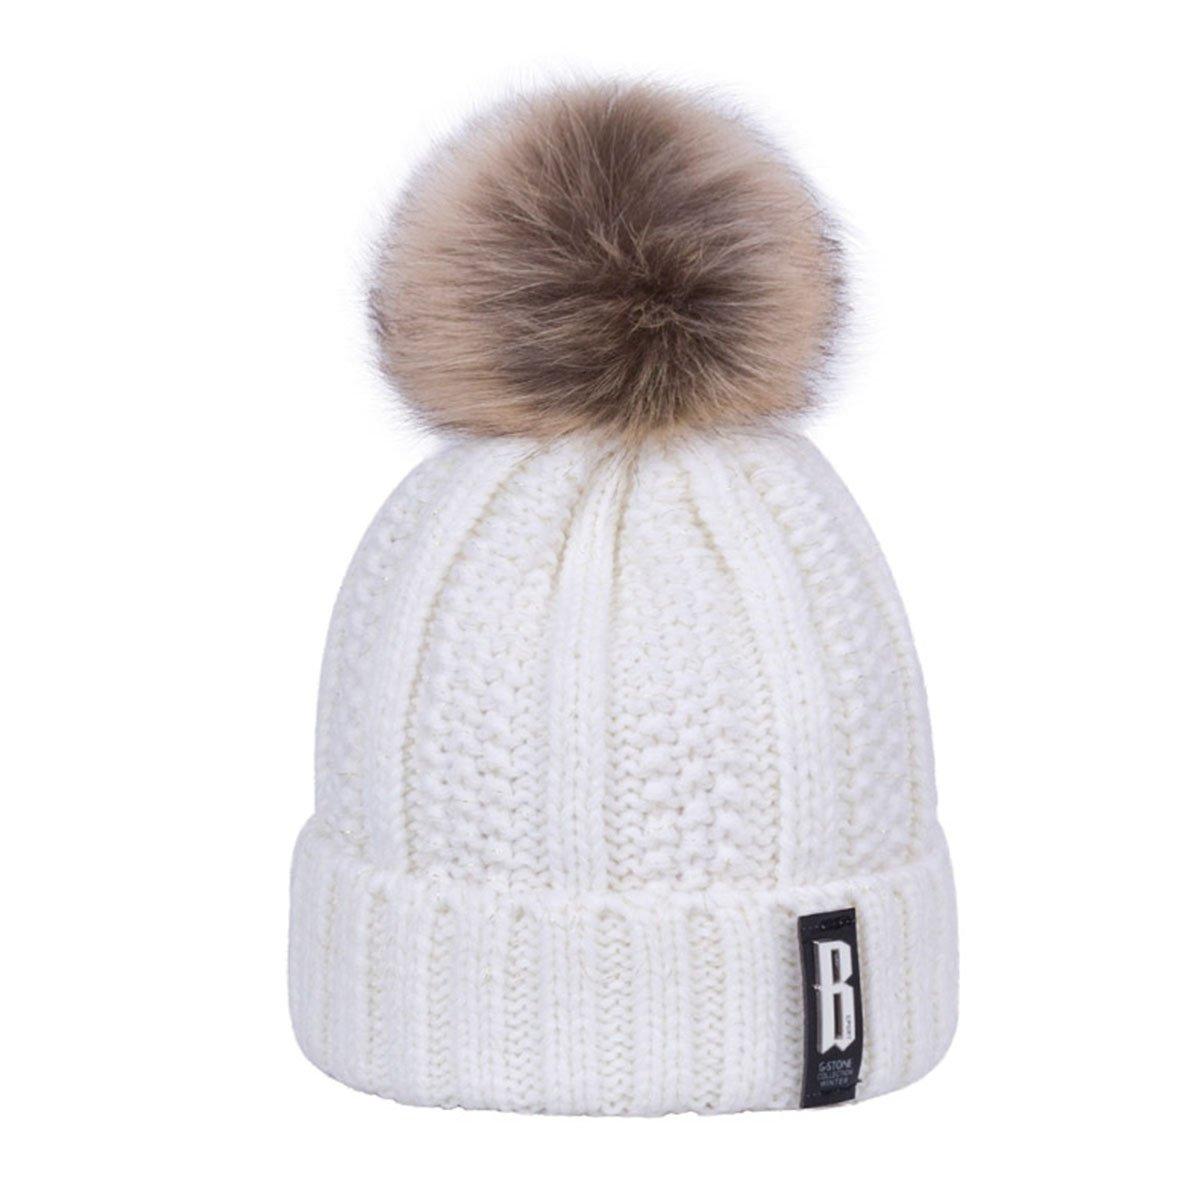 637a4729e86 Godea - Ensemble bonnet